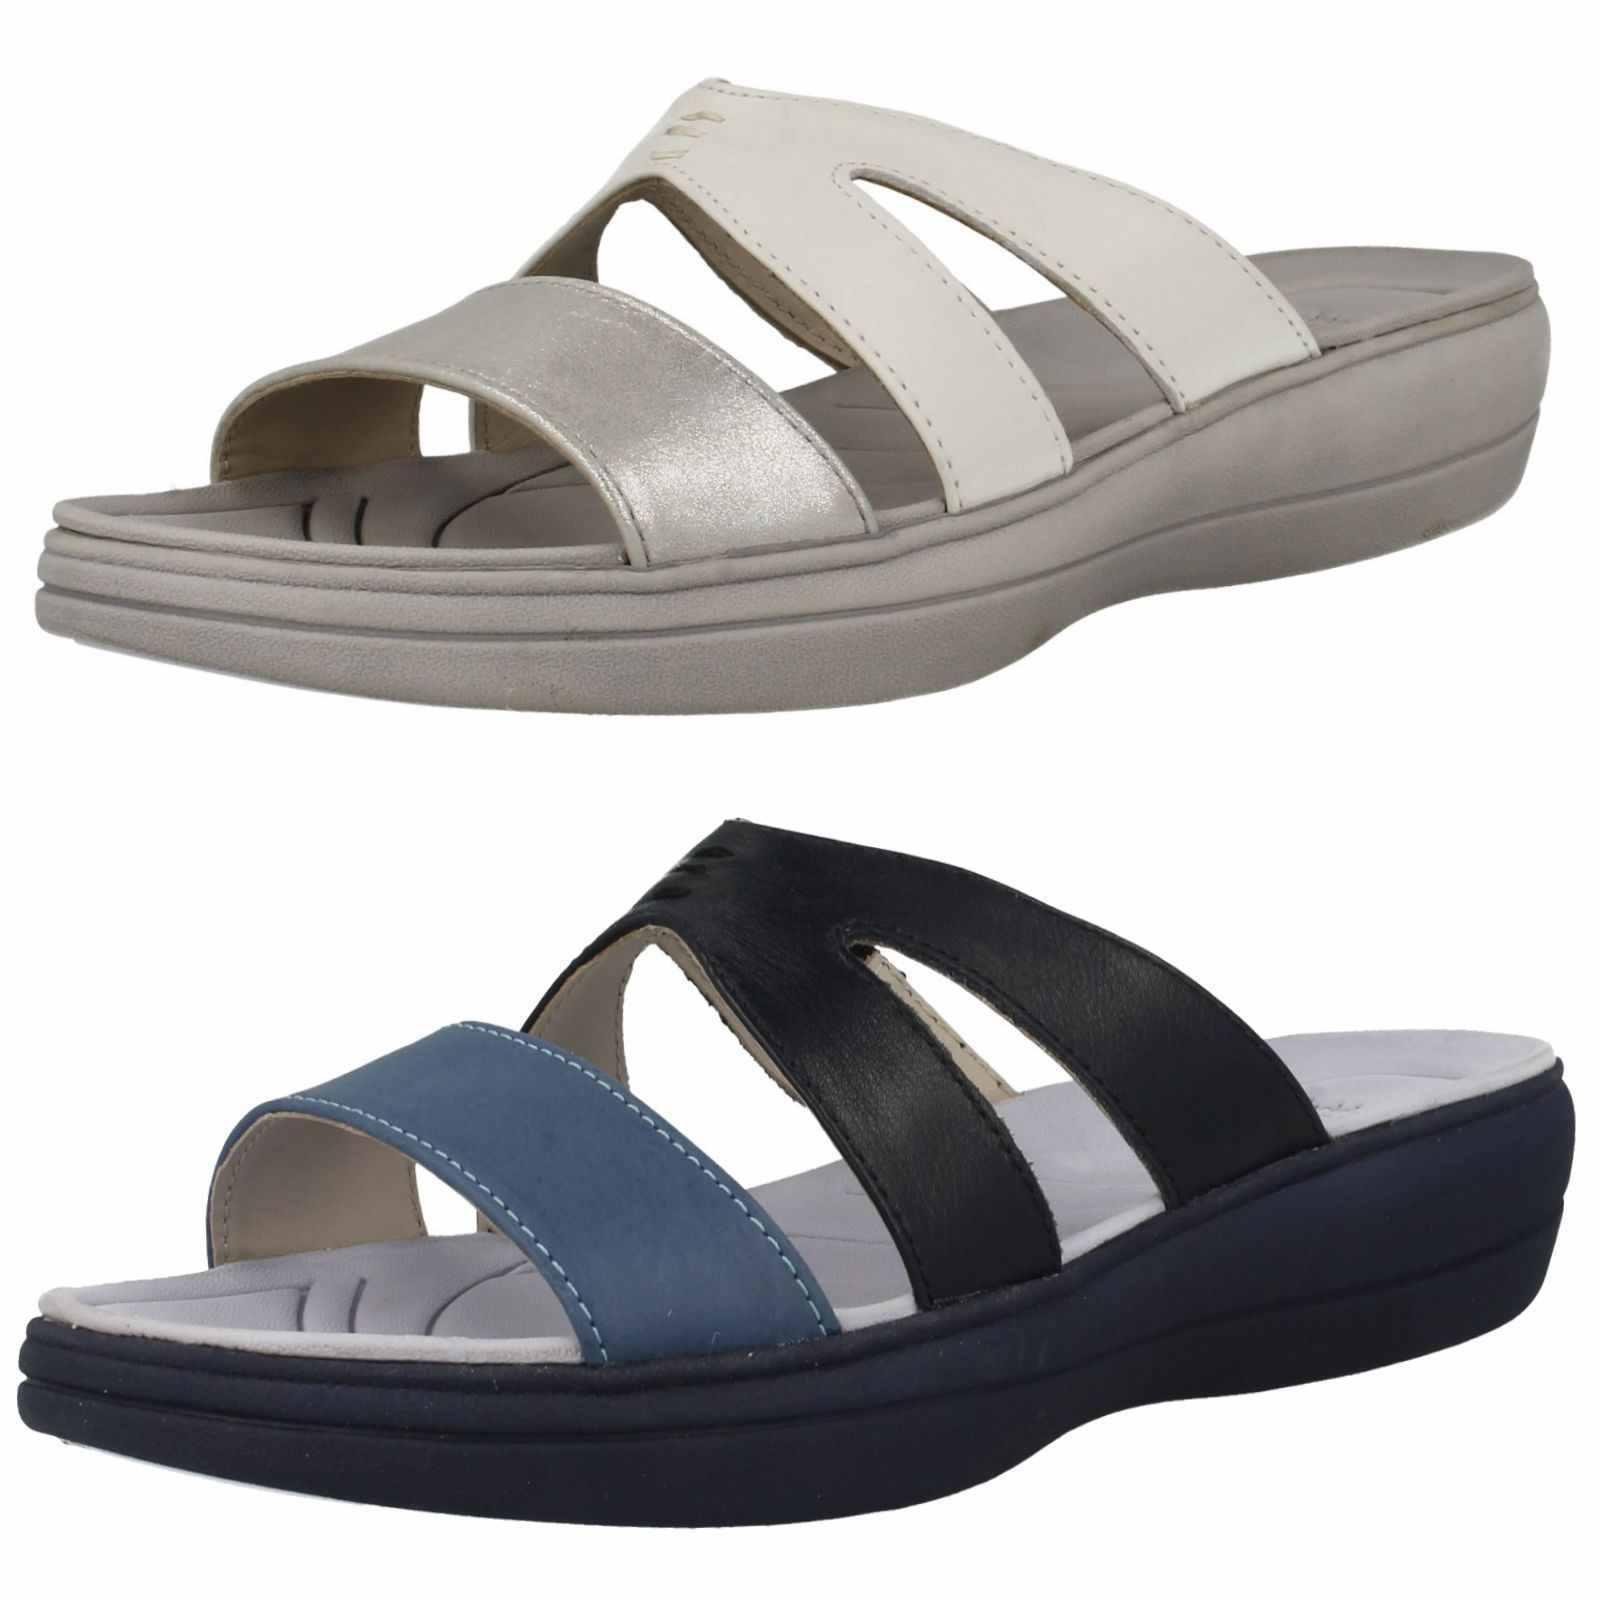 Casual salvaje Descuento por tiempo limitado Padders Charlie Ladies Slip On Leather Sandals in White/Silver or Blue Combi